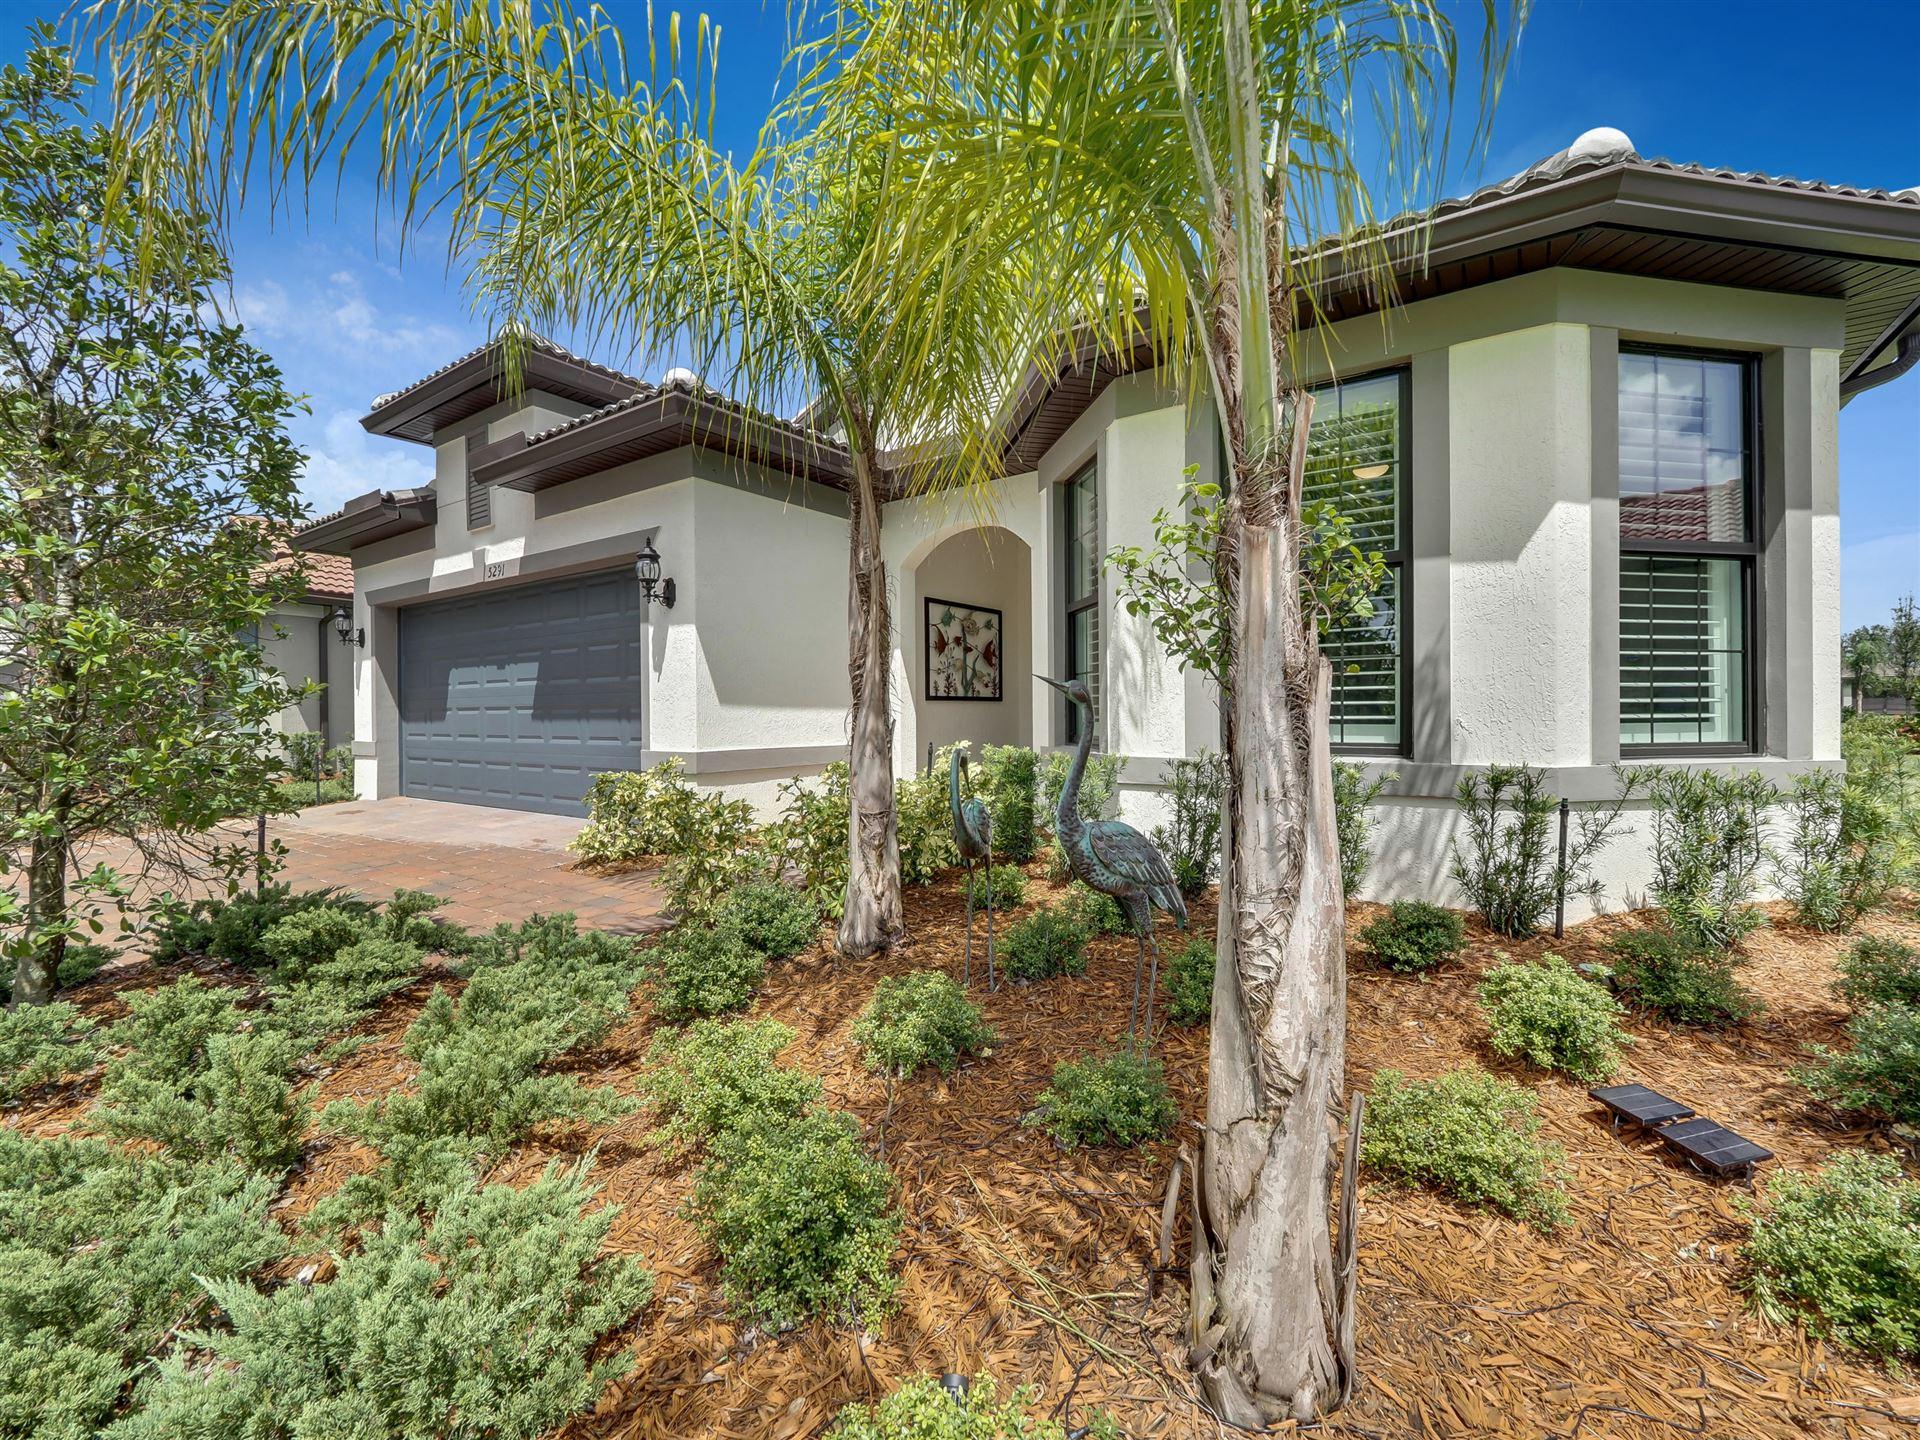 Photo of 5291 Turtle Creek Circle, Vero Beach, FL 32967 (MLS # RX-10640633)